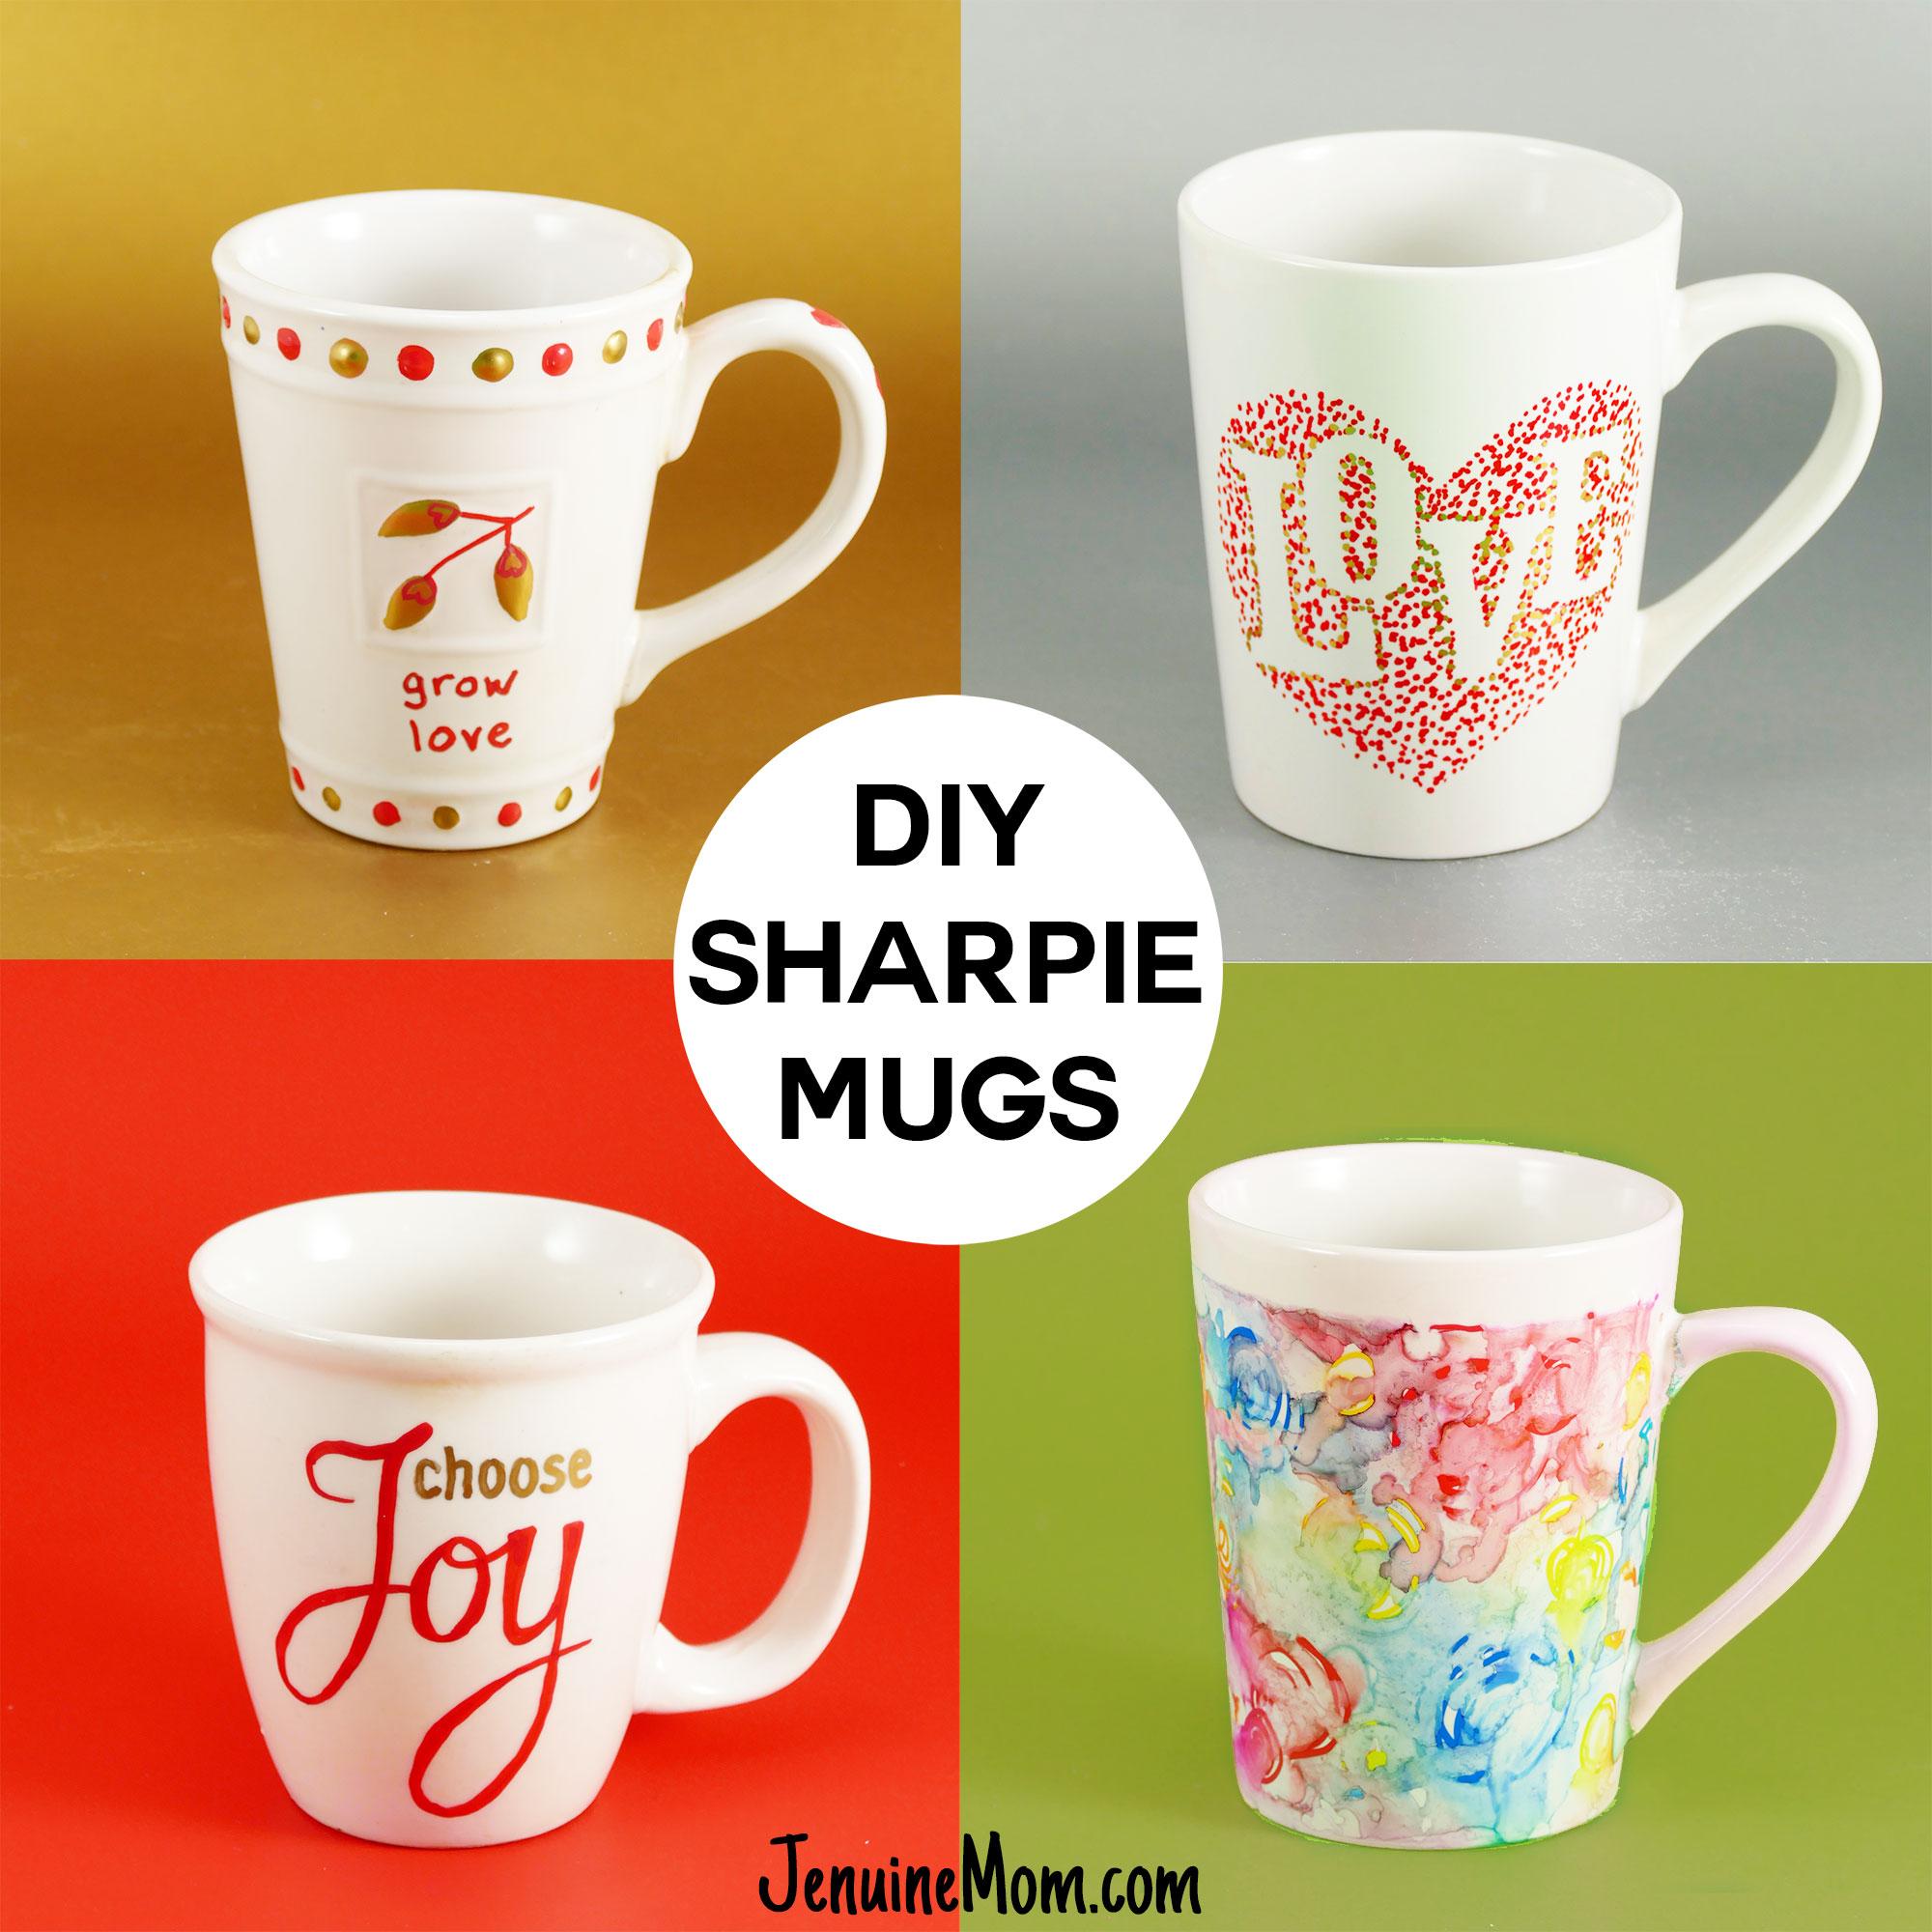 DIY Sharpie Mugs Tutorial   JenuineMom.com